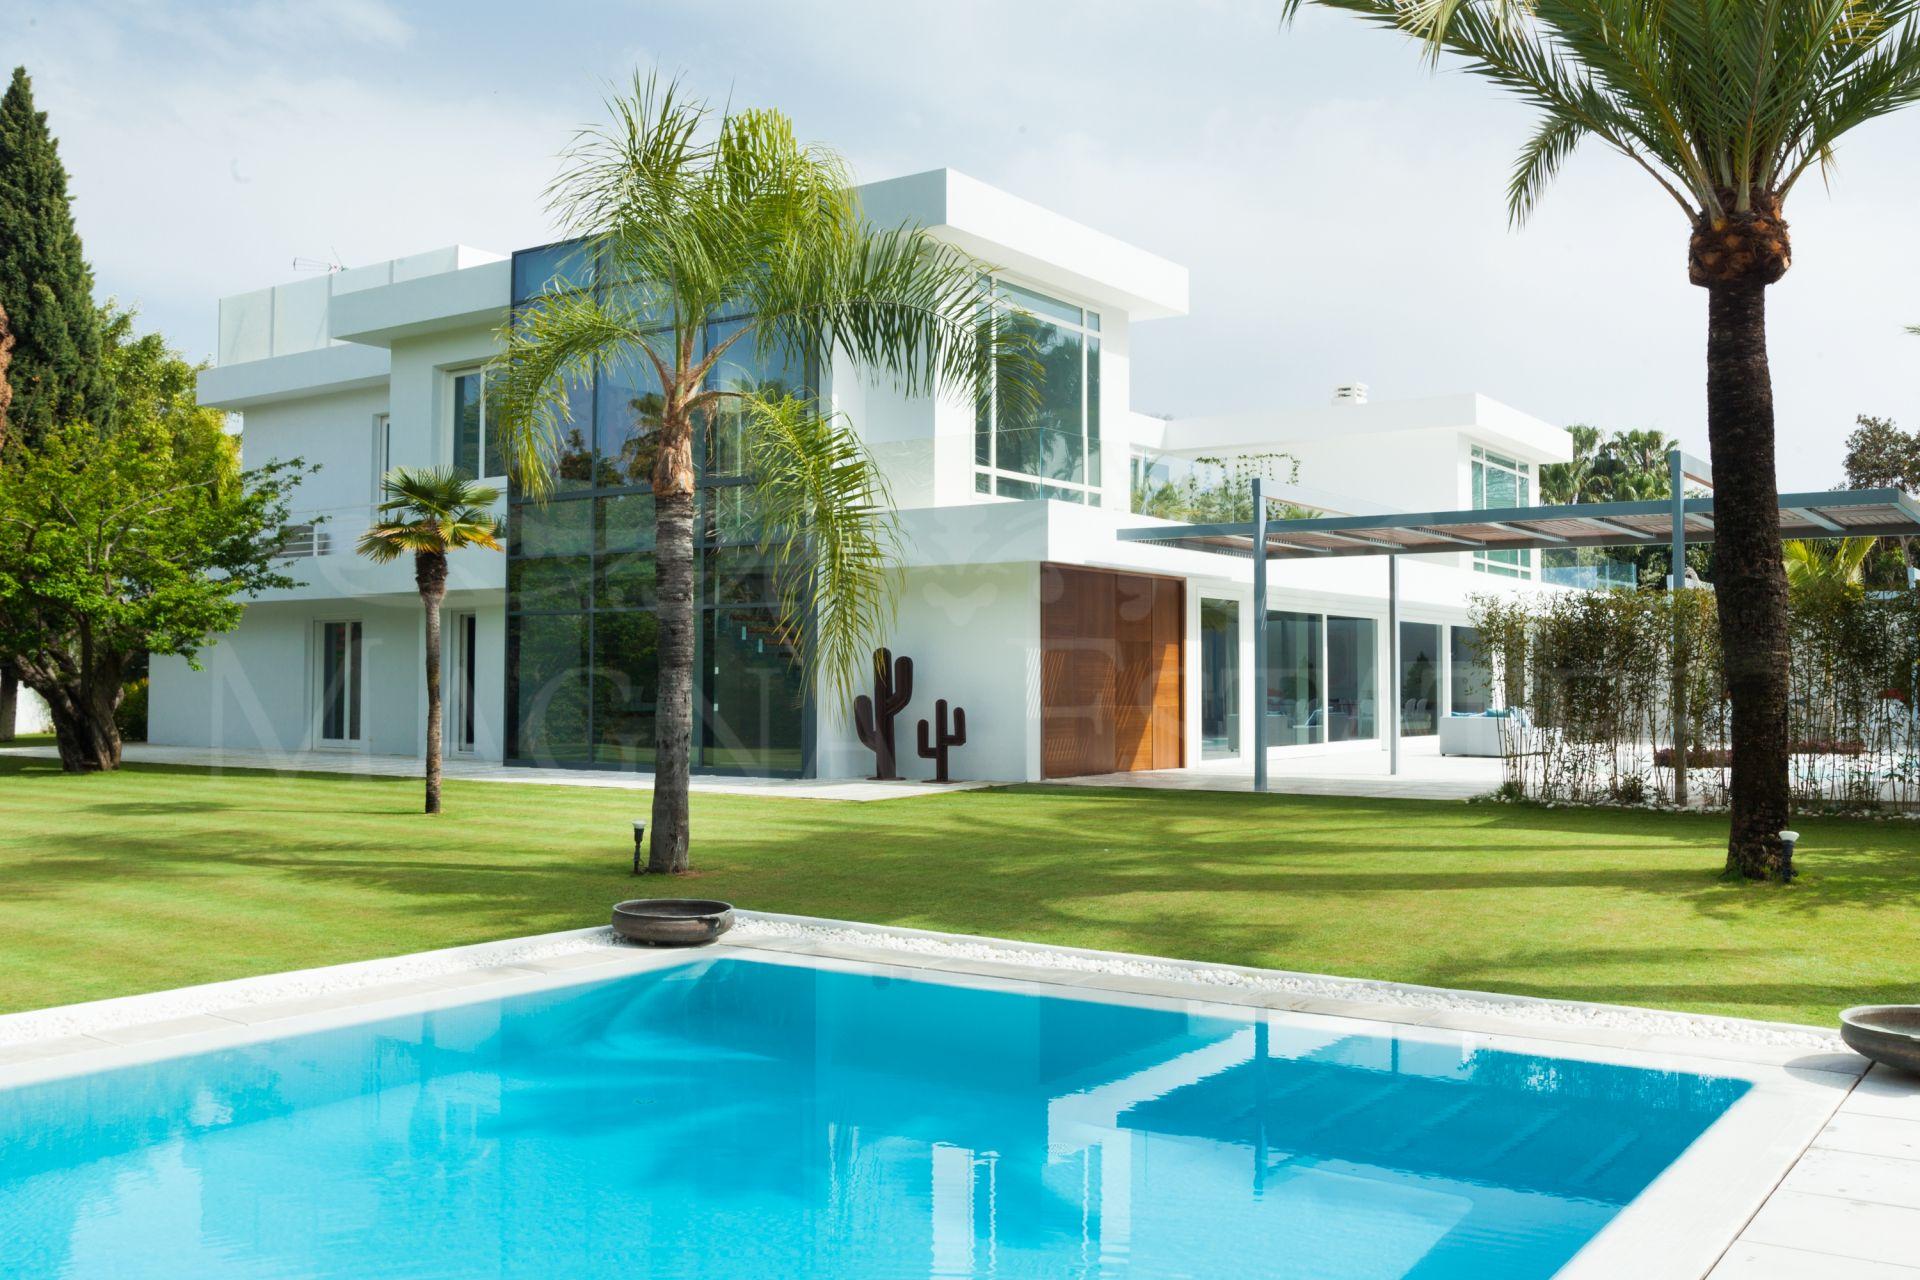 Imposing renovated villa in Guadalmina Baja, Marbella